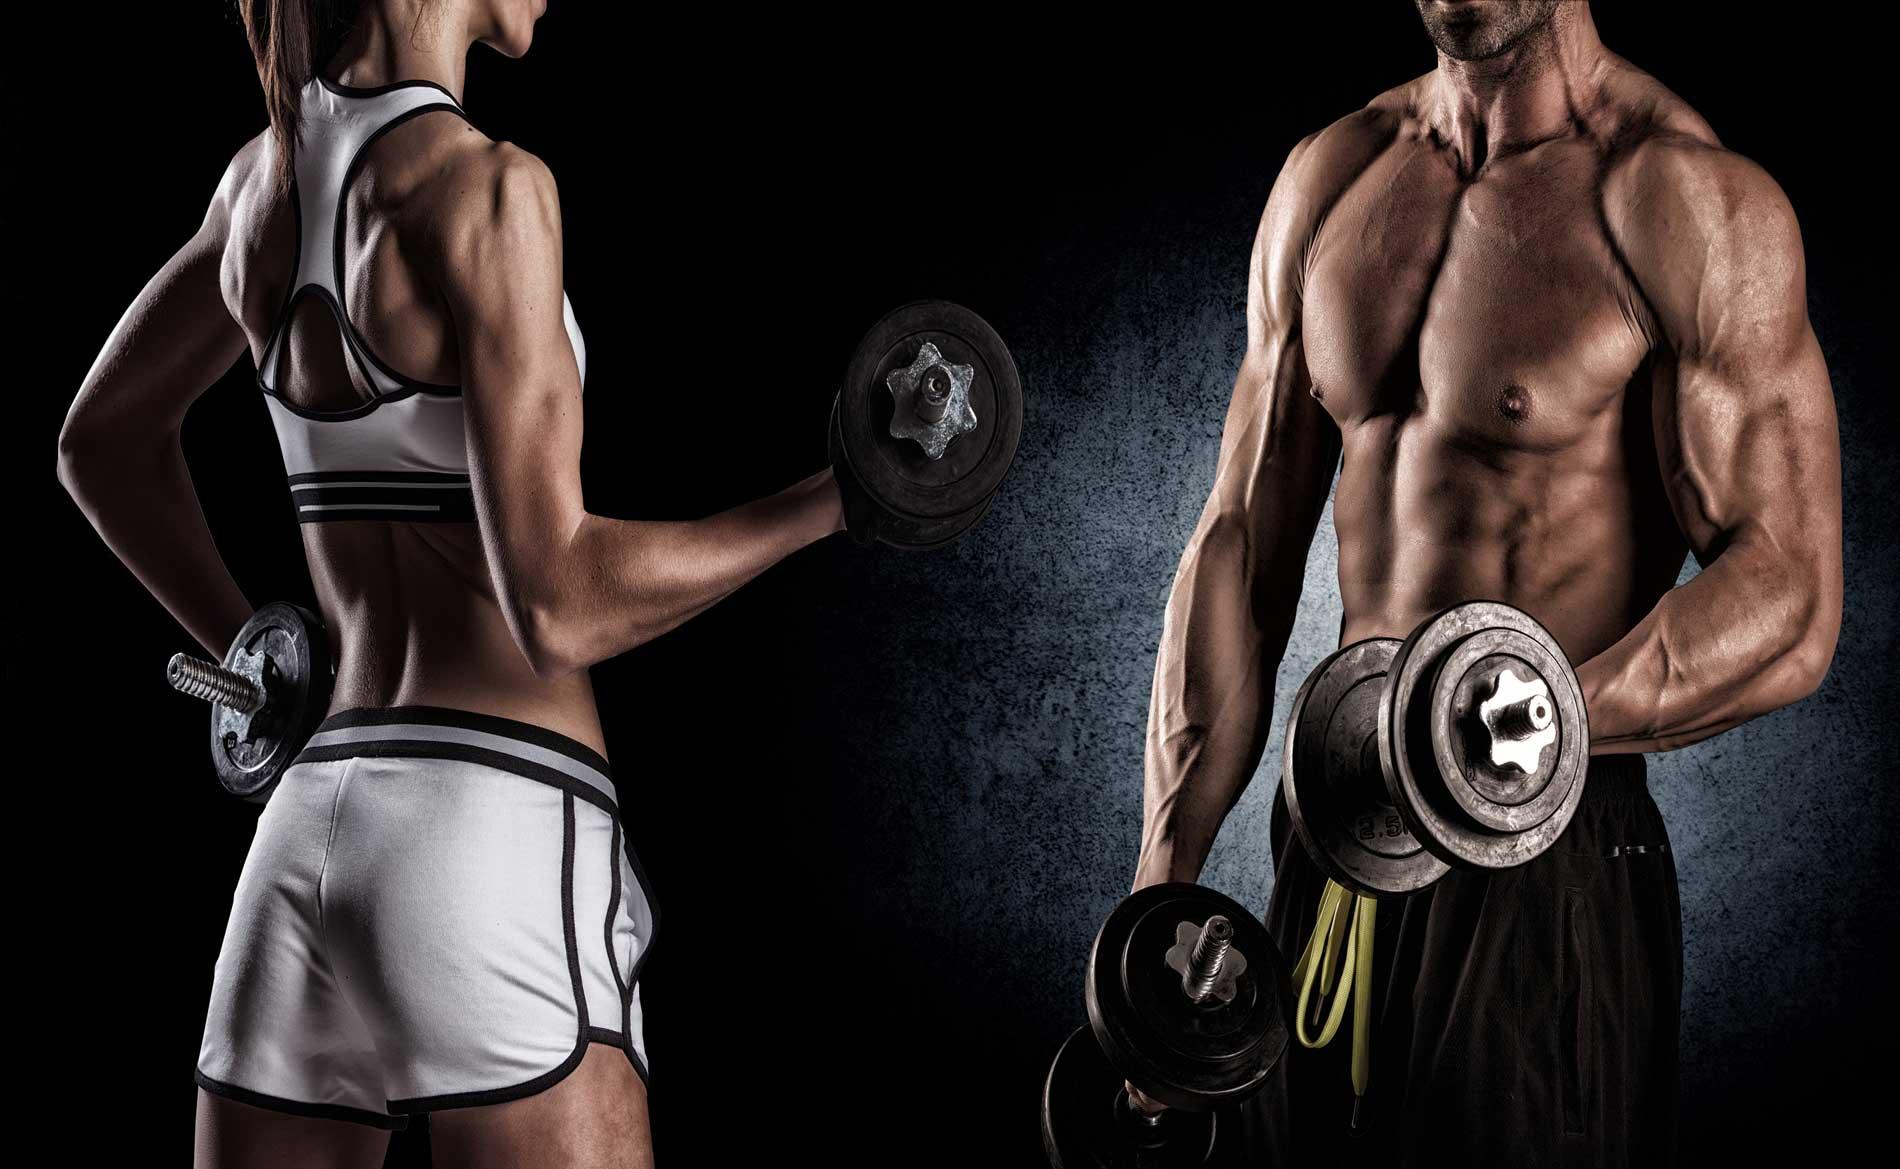 Wallpaper Sport Fitness: Gym Workout Wallpapers